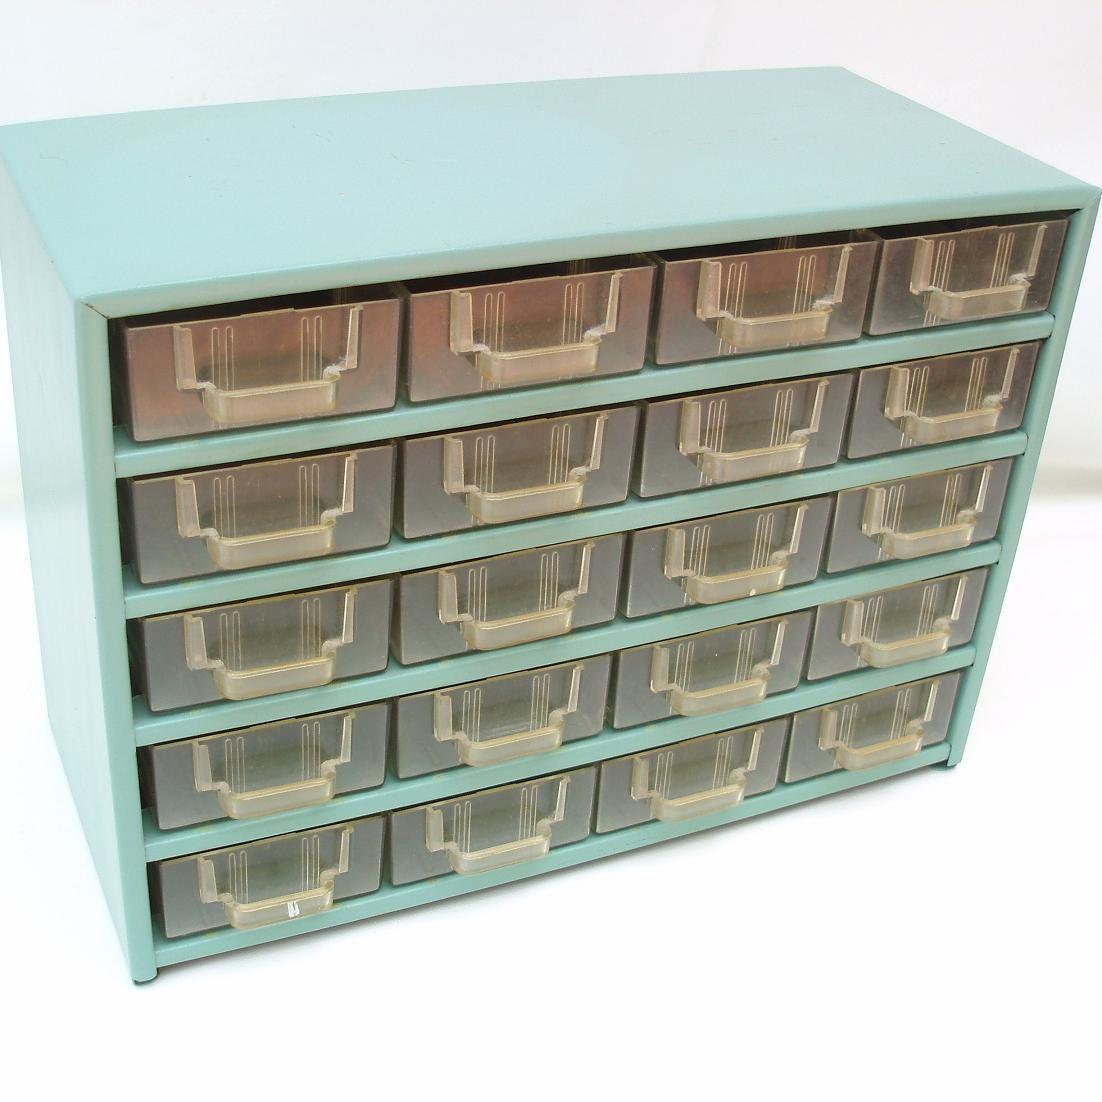 Craft storage drawers plastic - Sold Vintage Metal Storage Organizer 20 Drawer Industrial Cabinet Storage Box Craft Supply Toolbox Plastic